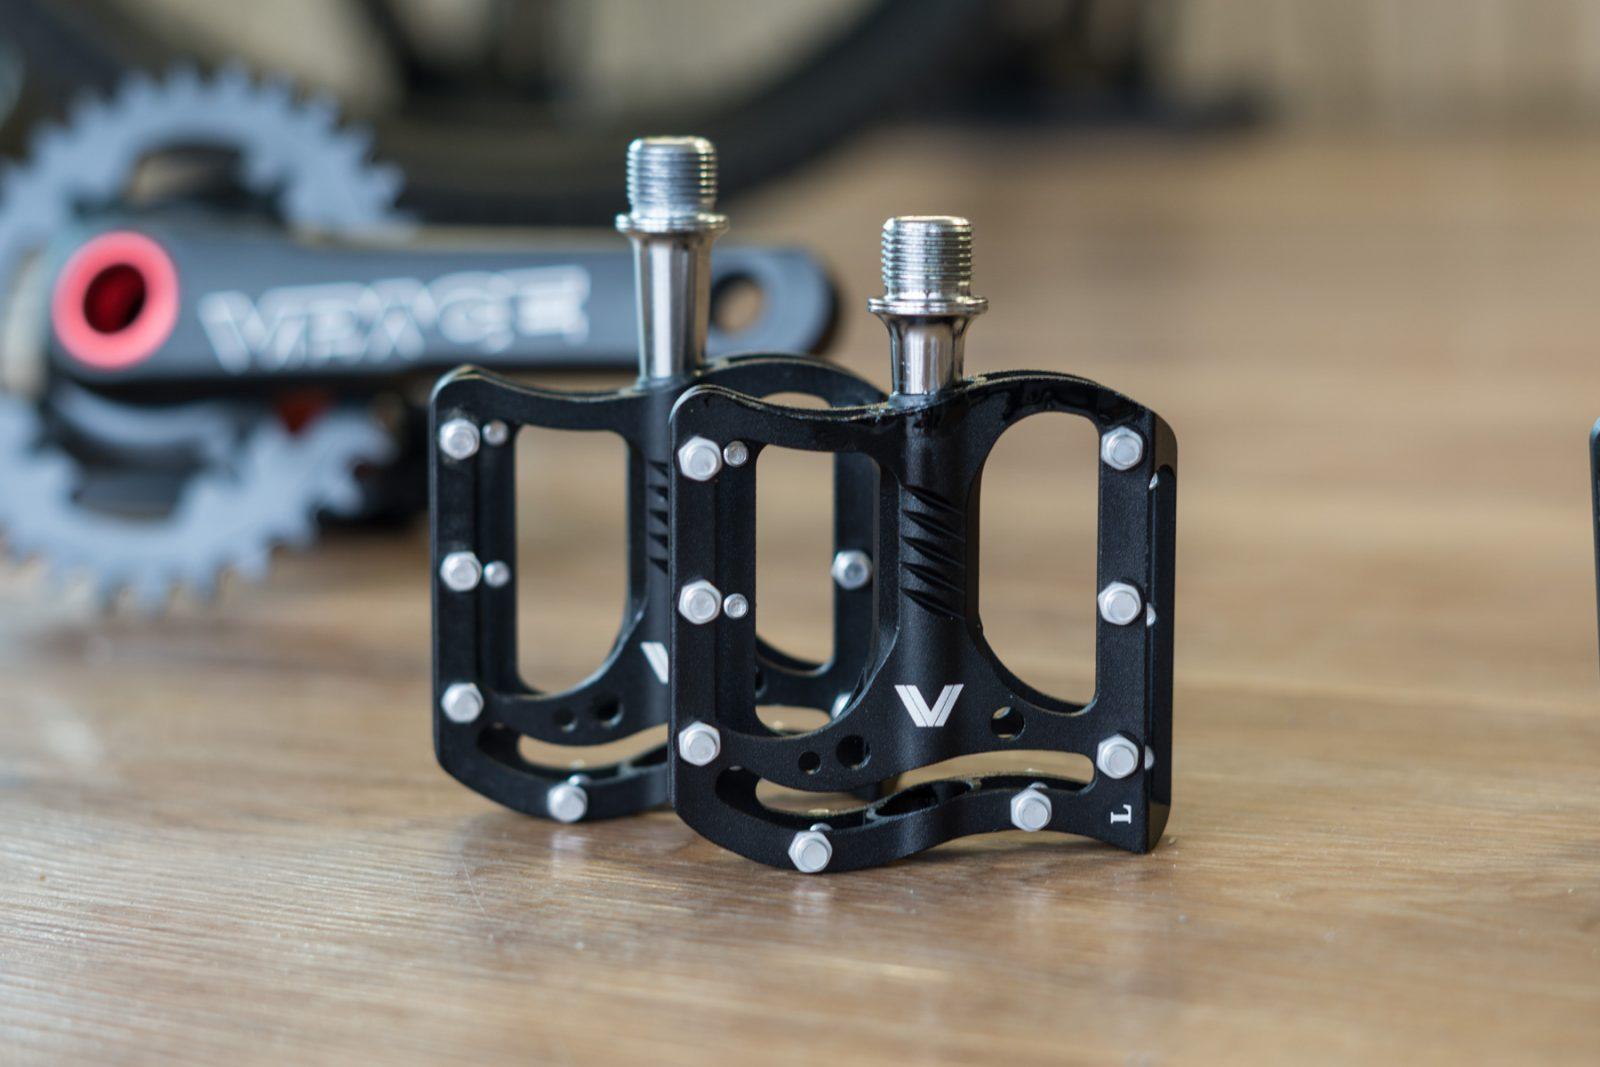 Mini Plattform Pedale mit neuem Q-Faktor